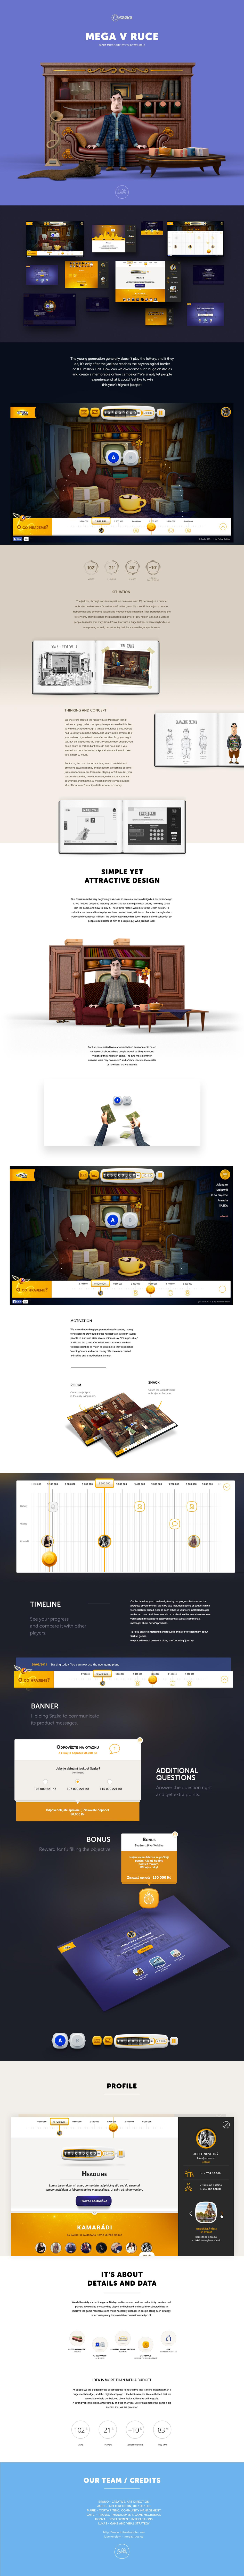 campaign sazka microsite Czech followbubble